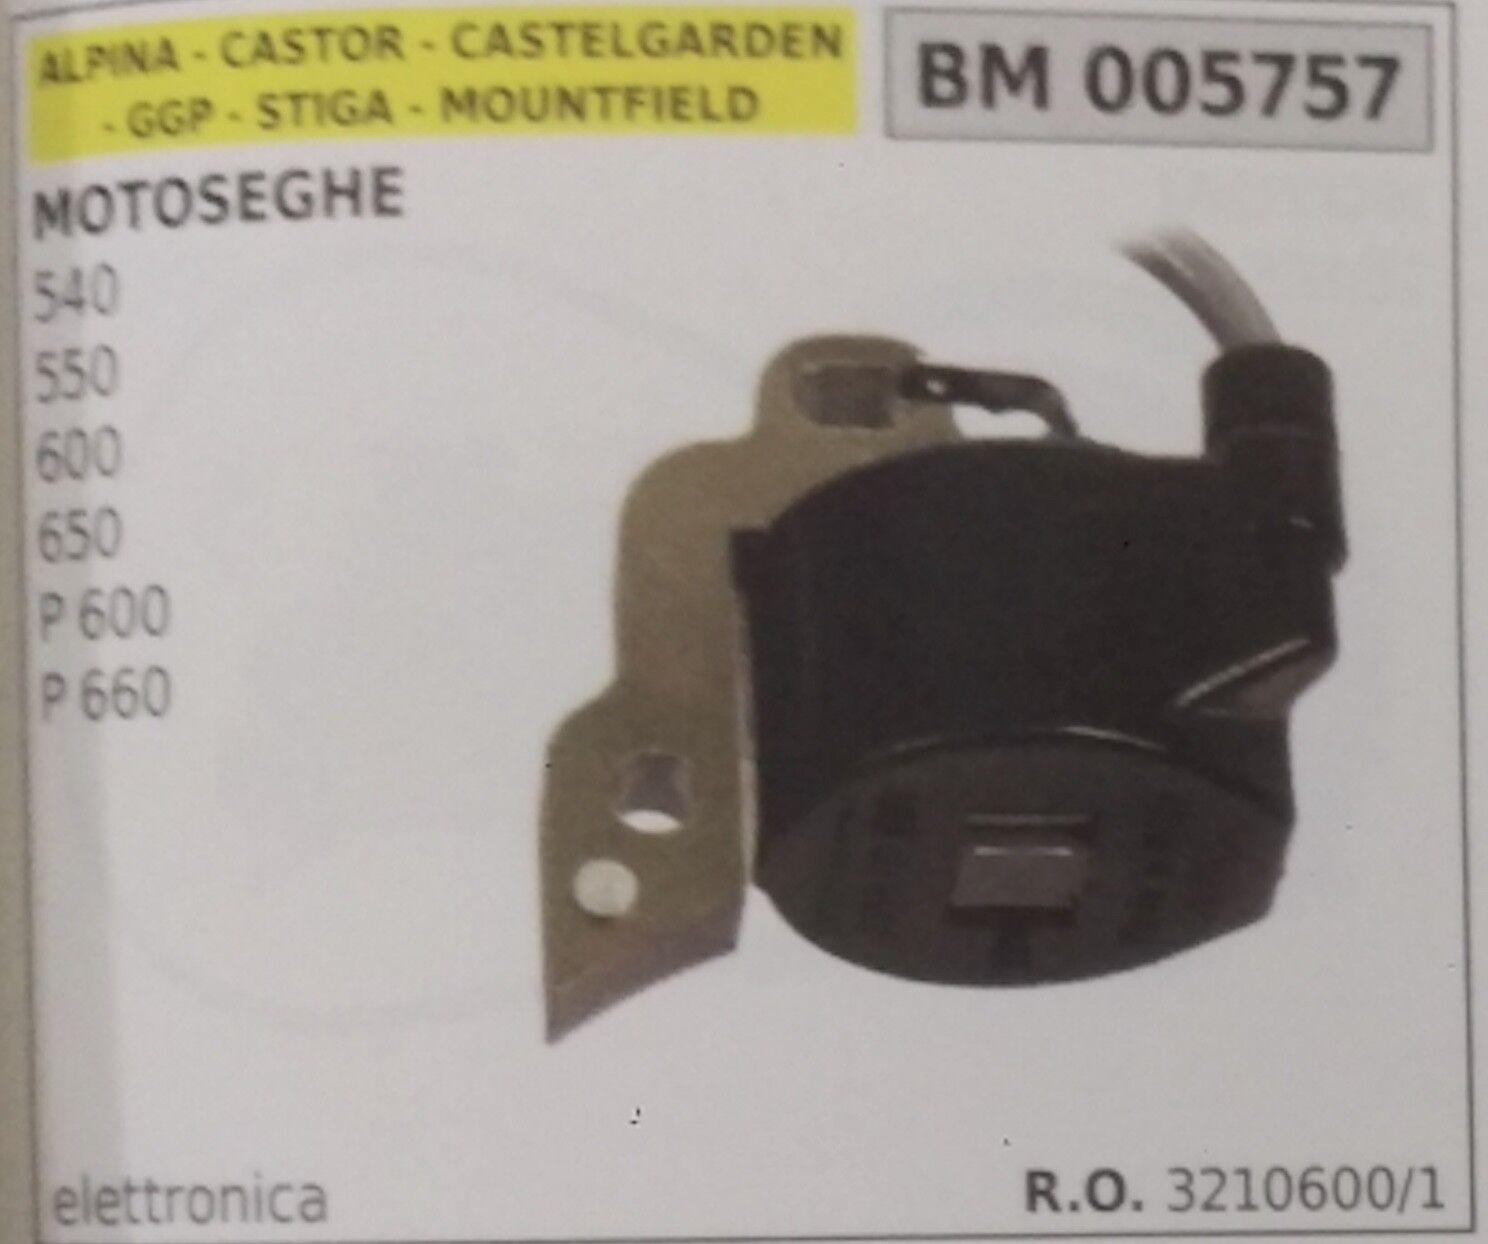 sconto 3210600 BOBINA ELETTRONICA MOTOSEGA ALPINA CASTOR CASTEL GARDEN 540 540 540 550 600 650  risposte rapide